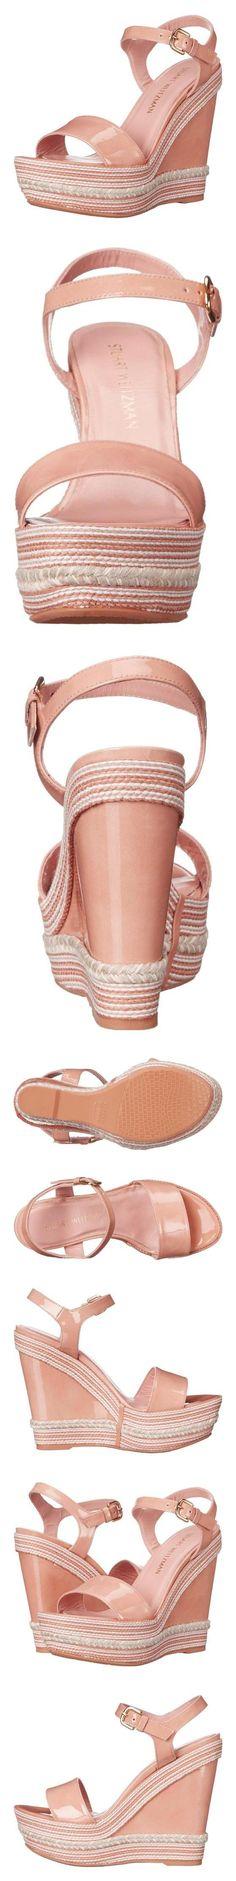 $445 - Stuart Weitzman Women's Single Wedge Sandal, Adobe, 10 M US #shoes #stuartweitzman #sandals